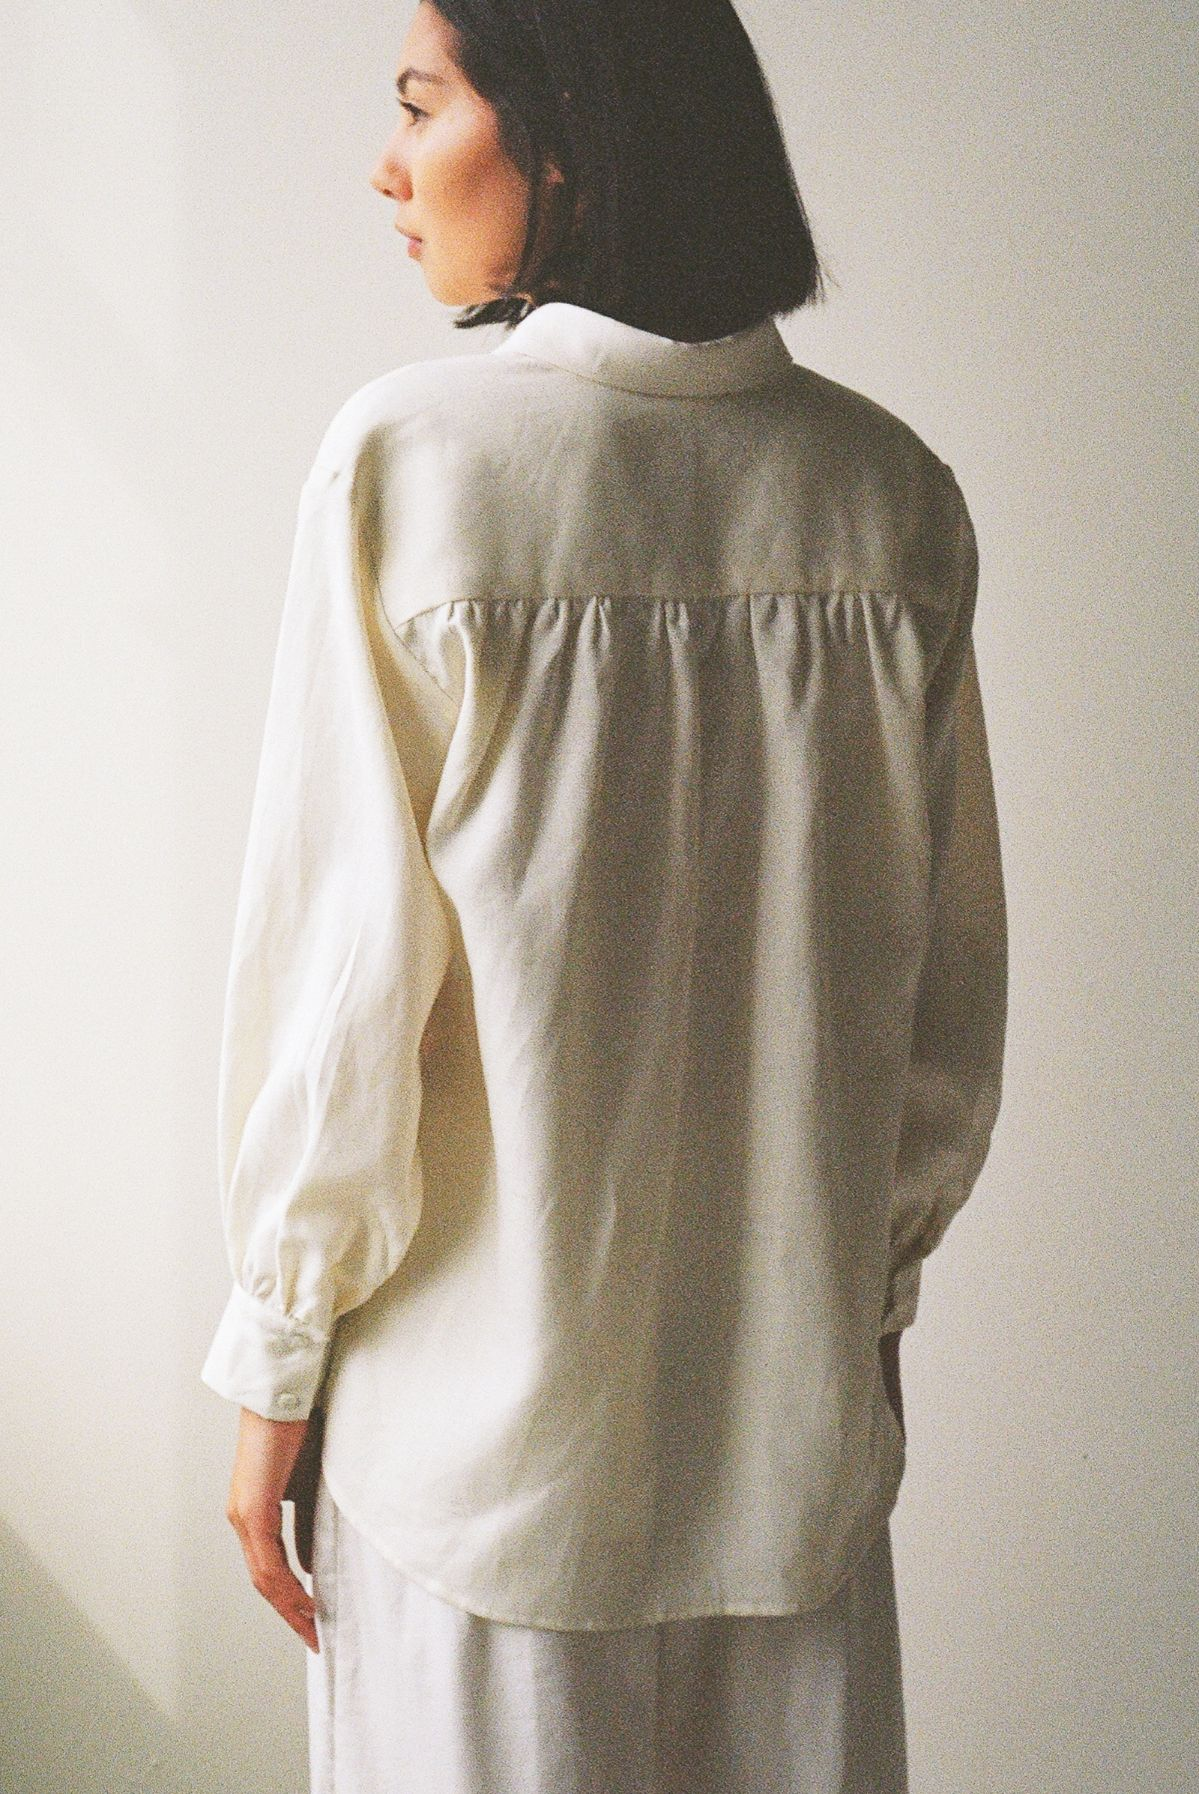 Mes shirt Ivory - Ellis Label - Linen - New Zealand clothing_0031_83090008